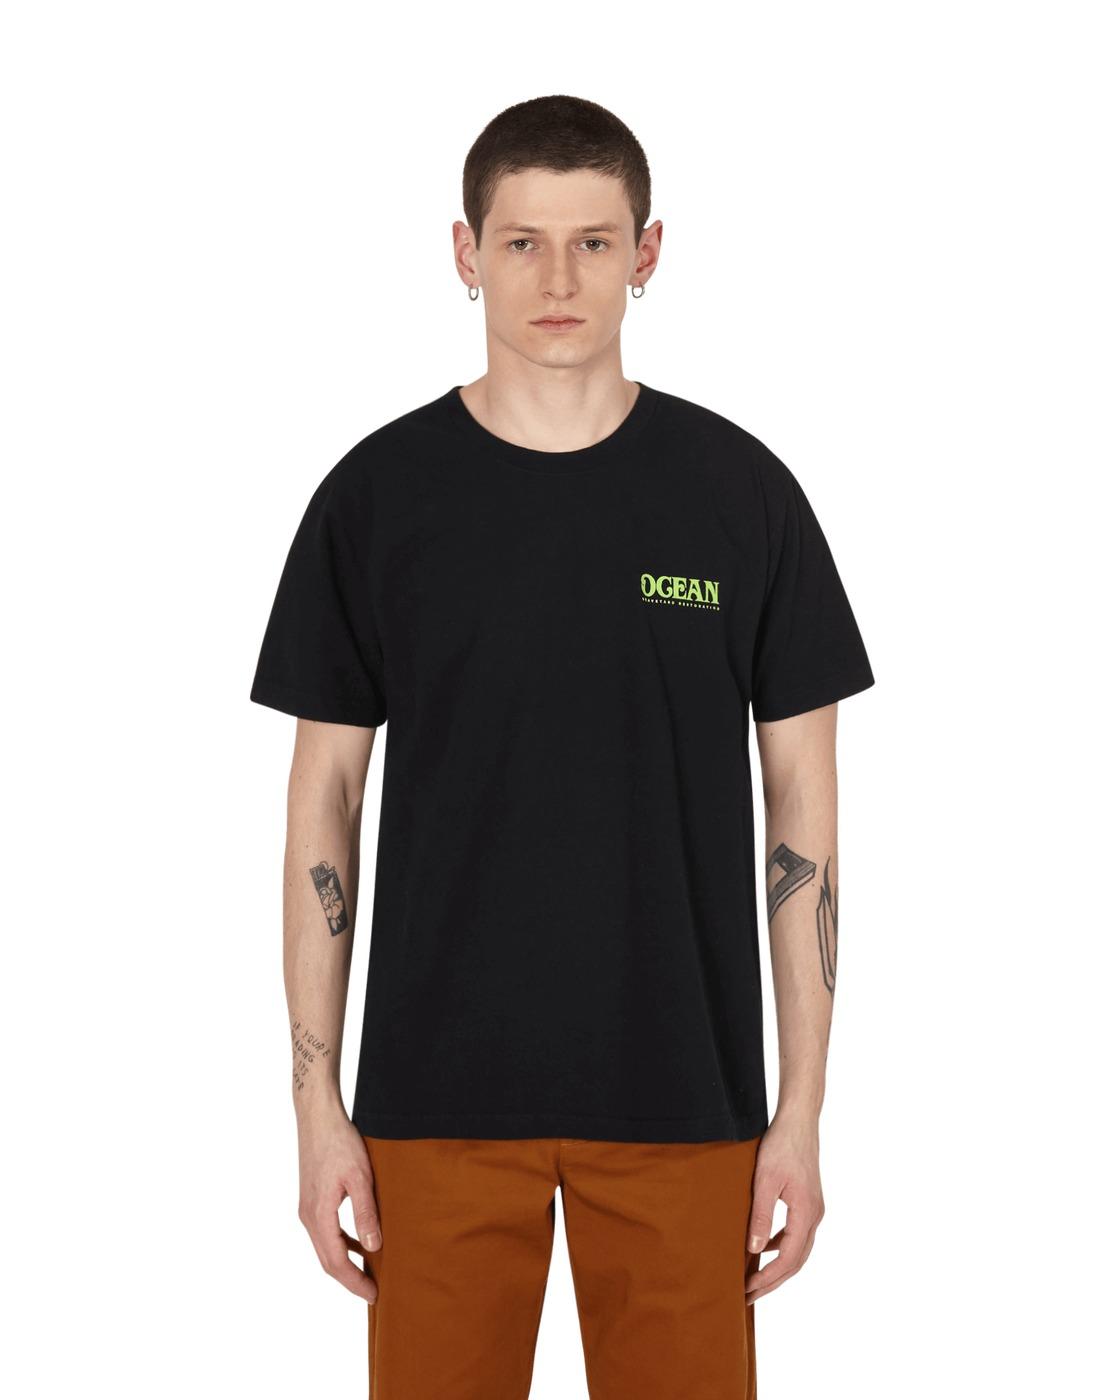 Eden Power Corp Ocean Recycled T Shirt Black